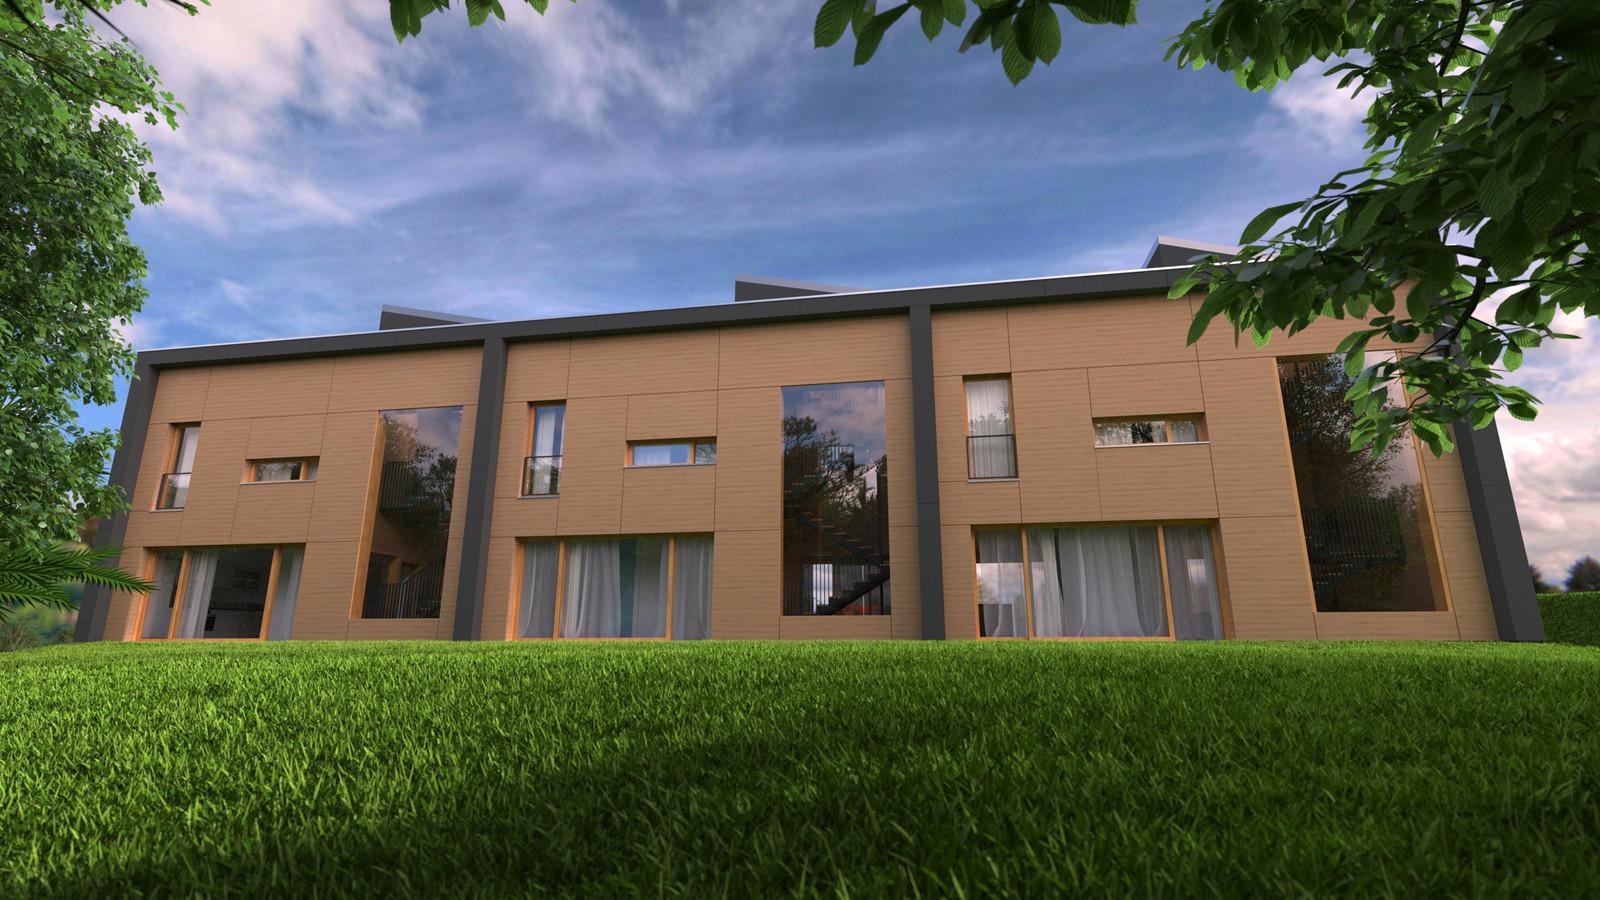 05 Exterior N ground level 04  KP webpage of project: http://www.kemppro.com/KP_3D_communication_3_Villas_Veyrier.html